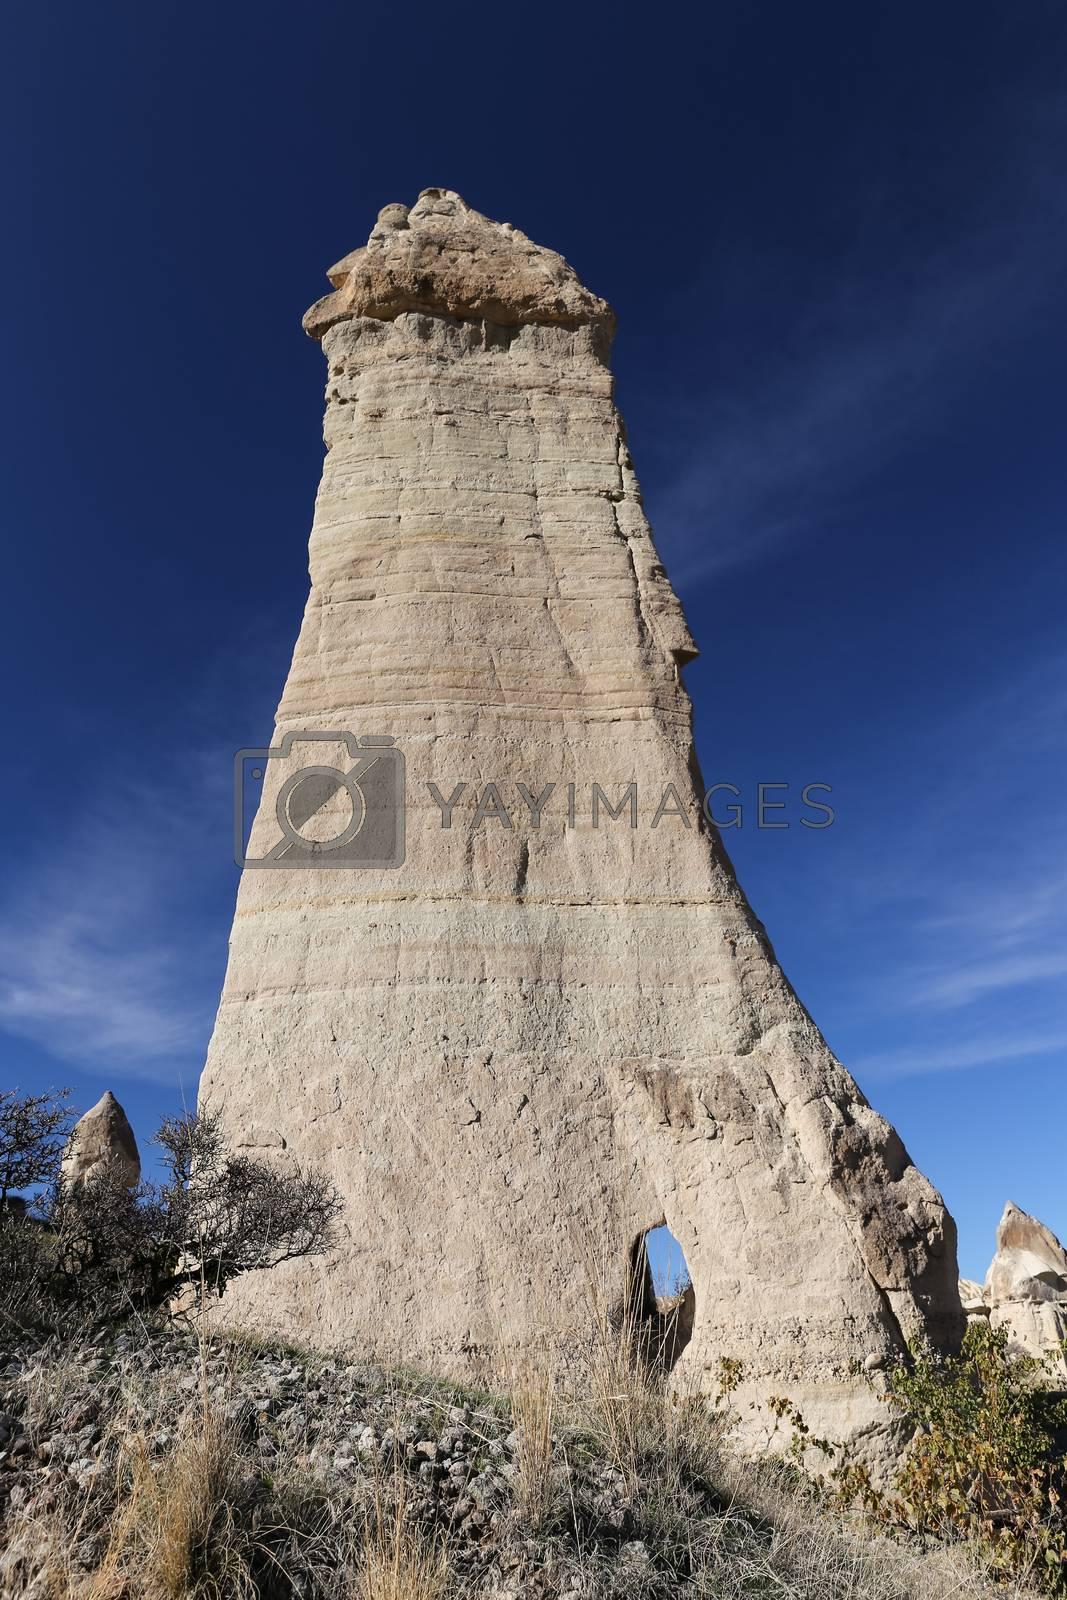 Rock Formations in Love Valley, Cappadocia, Nevsehir, Turkey by EvrenKalinbacak